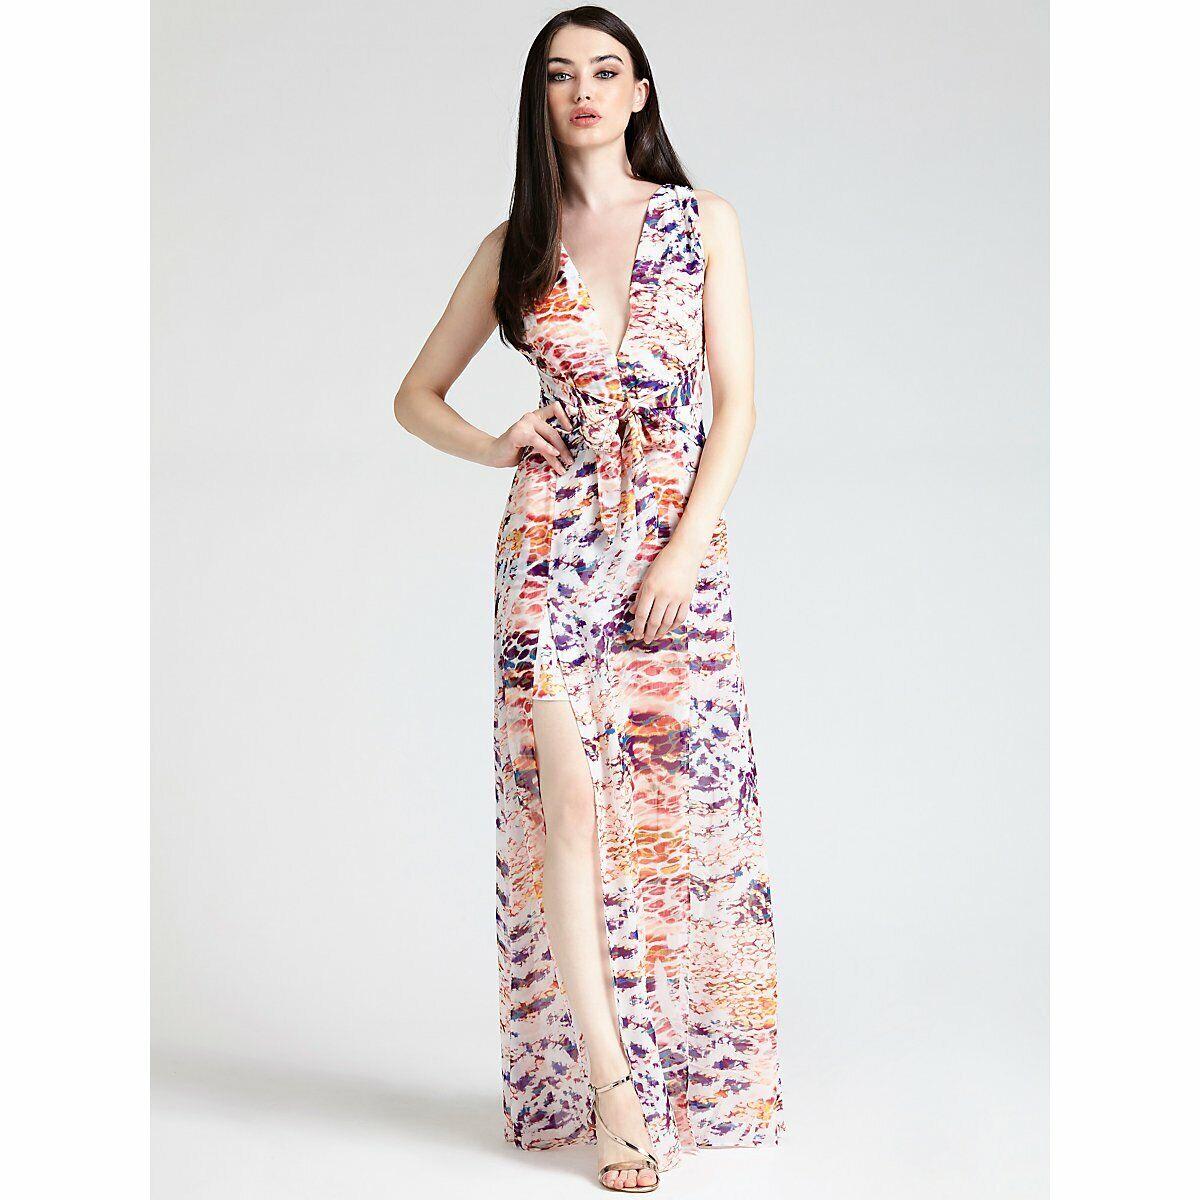 GUESS BY MARCIANO ABITO women GILDA DRESS